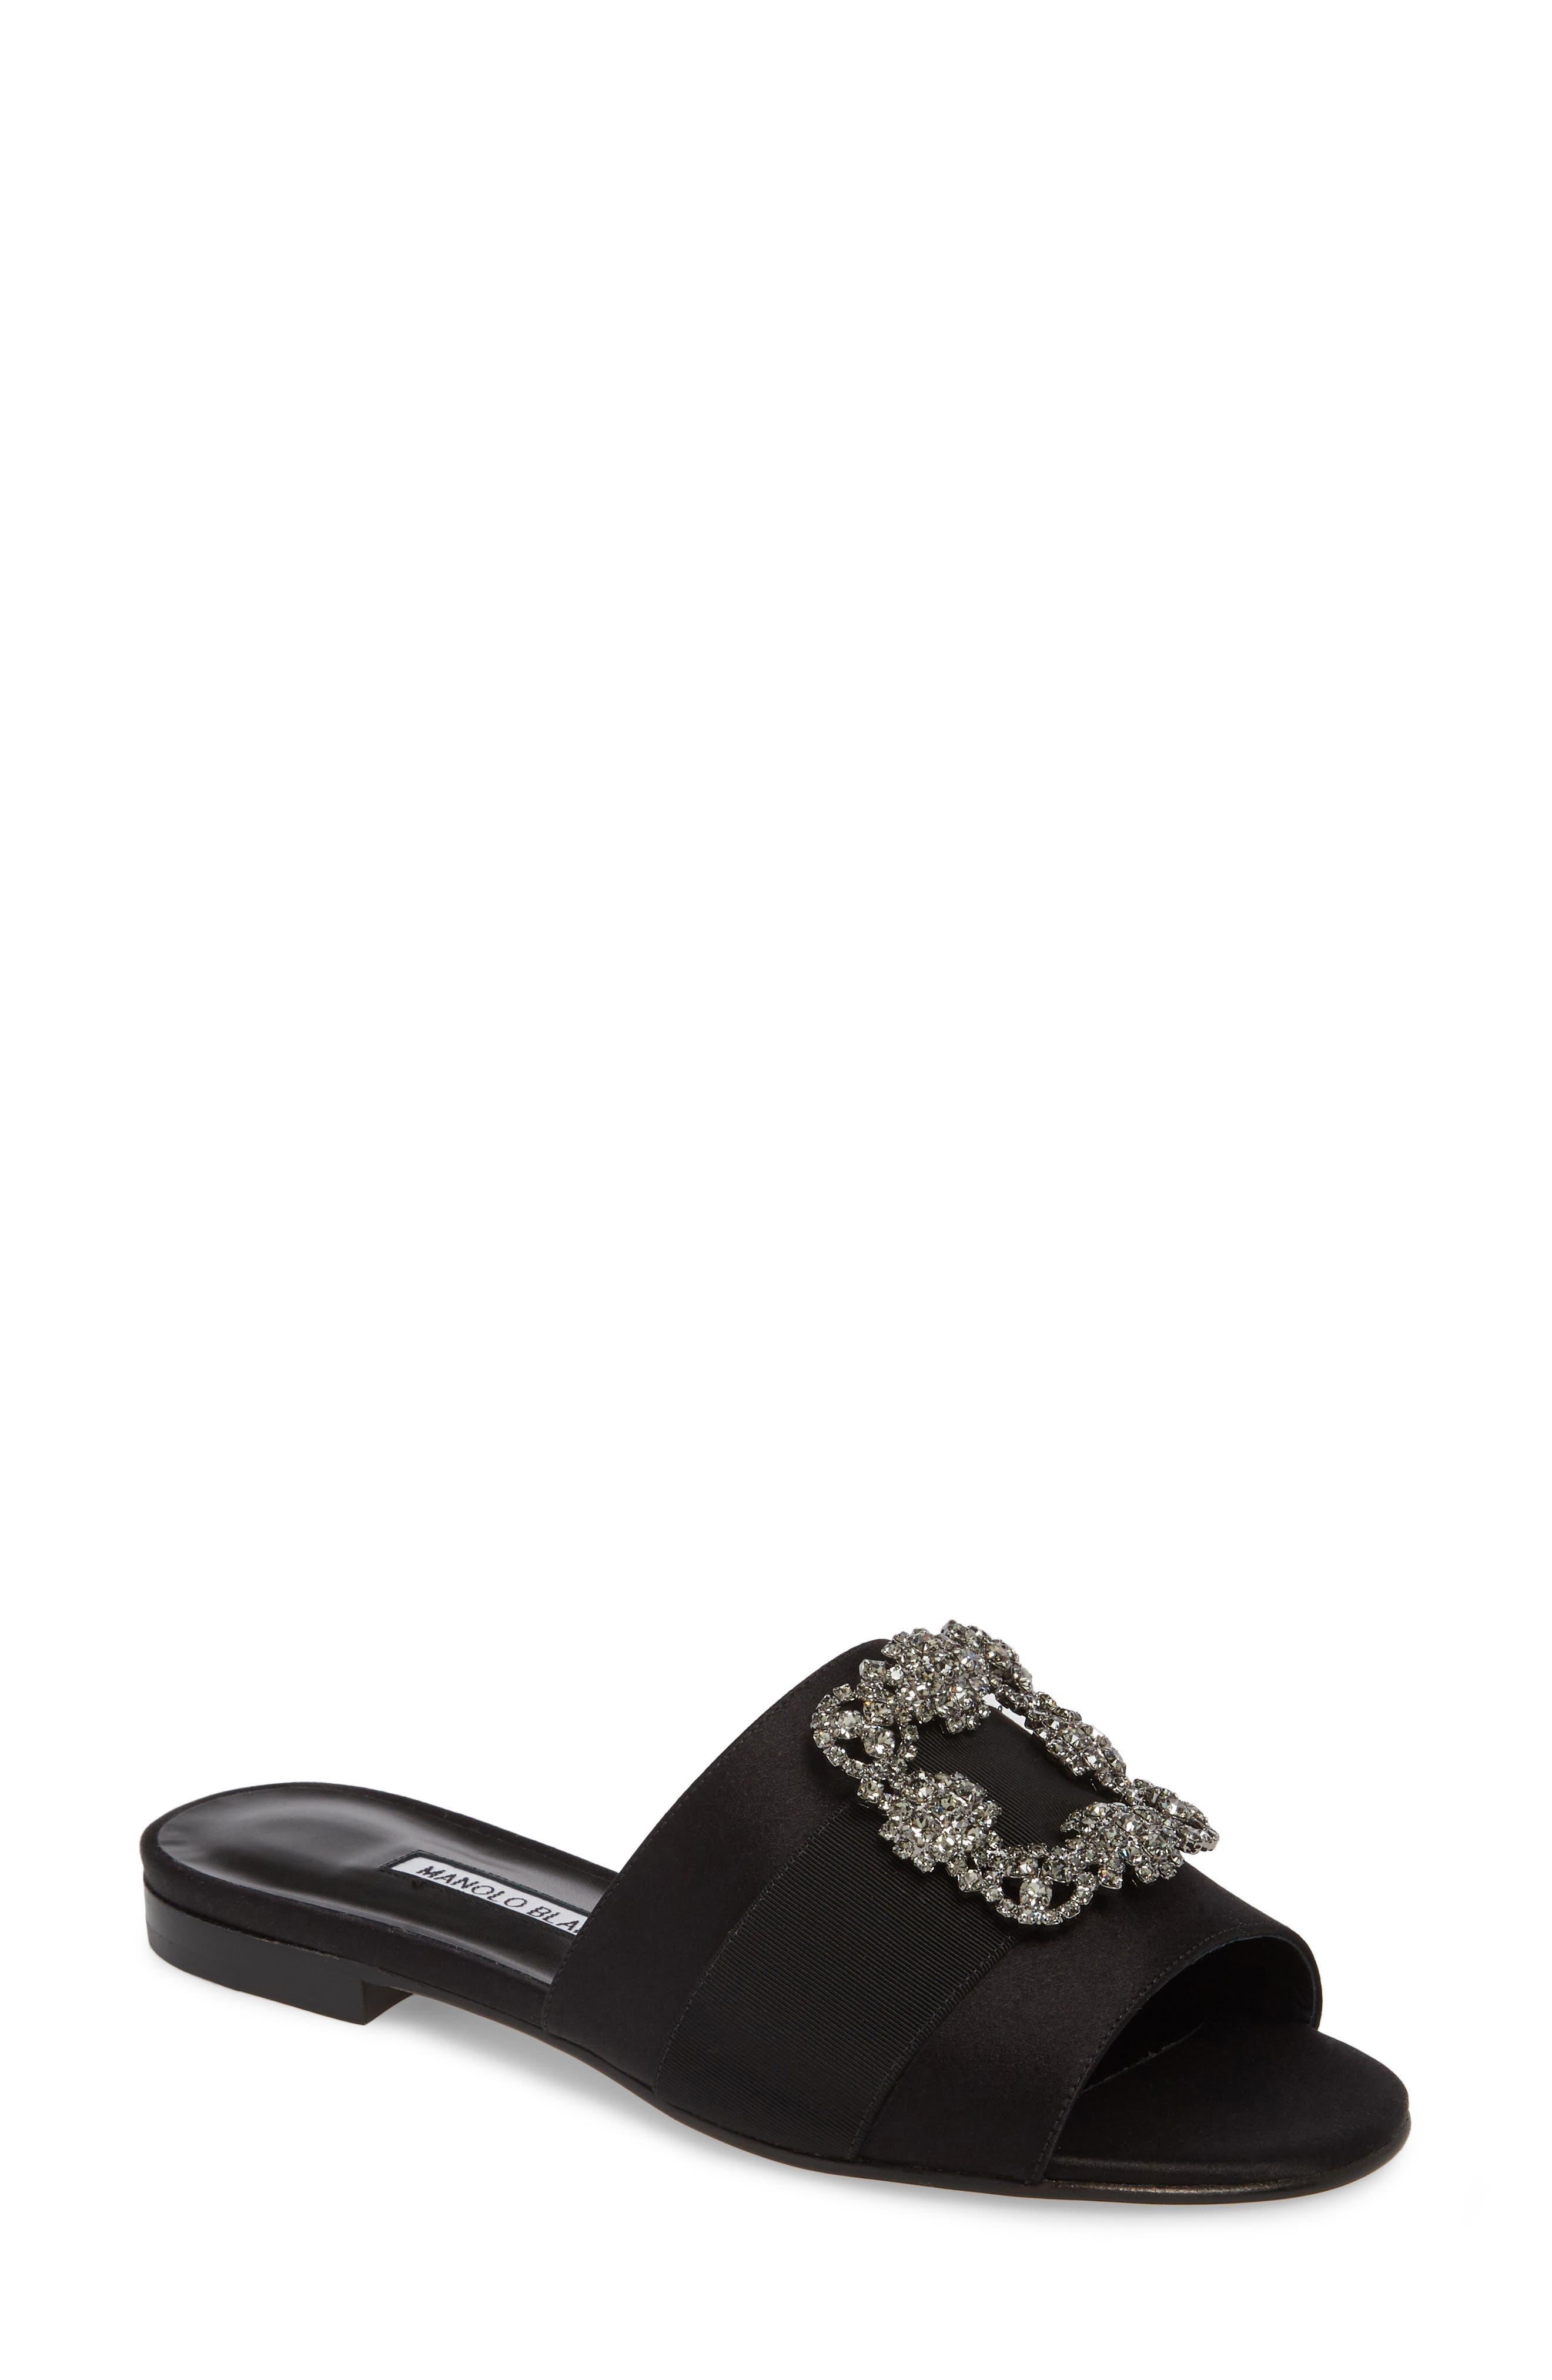 Main Image - Manolo Blahnik Martamod Crystal Embellished Slide Sandal (Women)